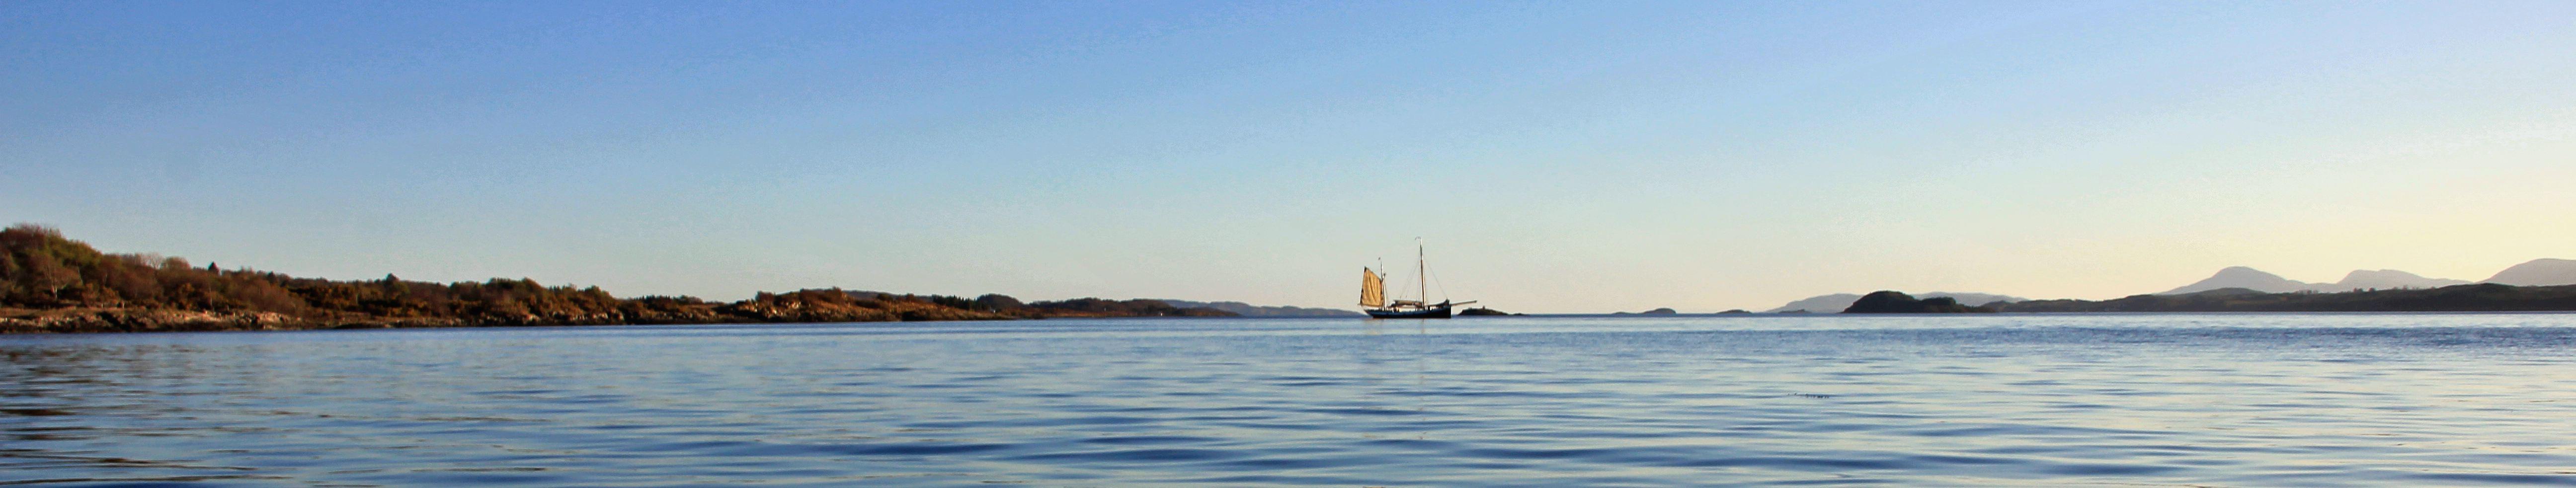 Sailing in Scotland